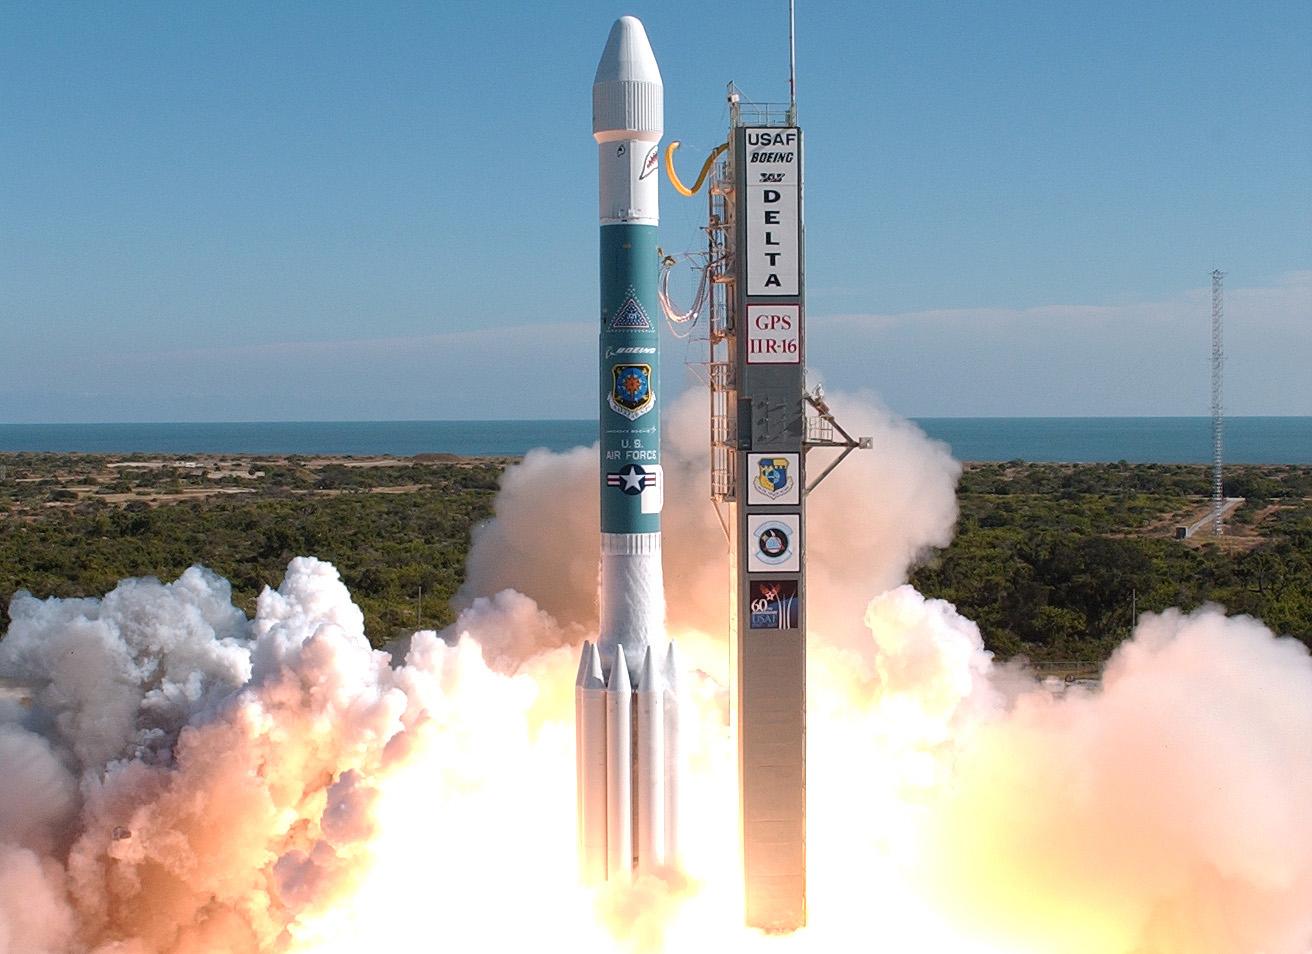 gps block iir 16 m satellite launch successful